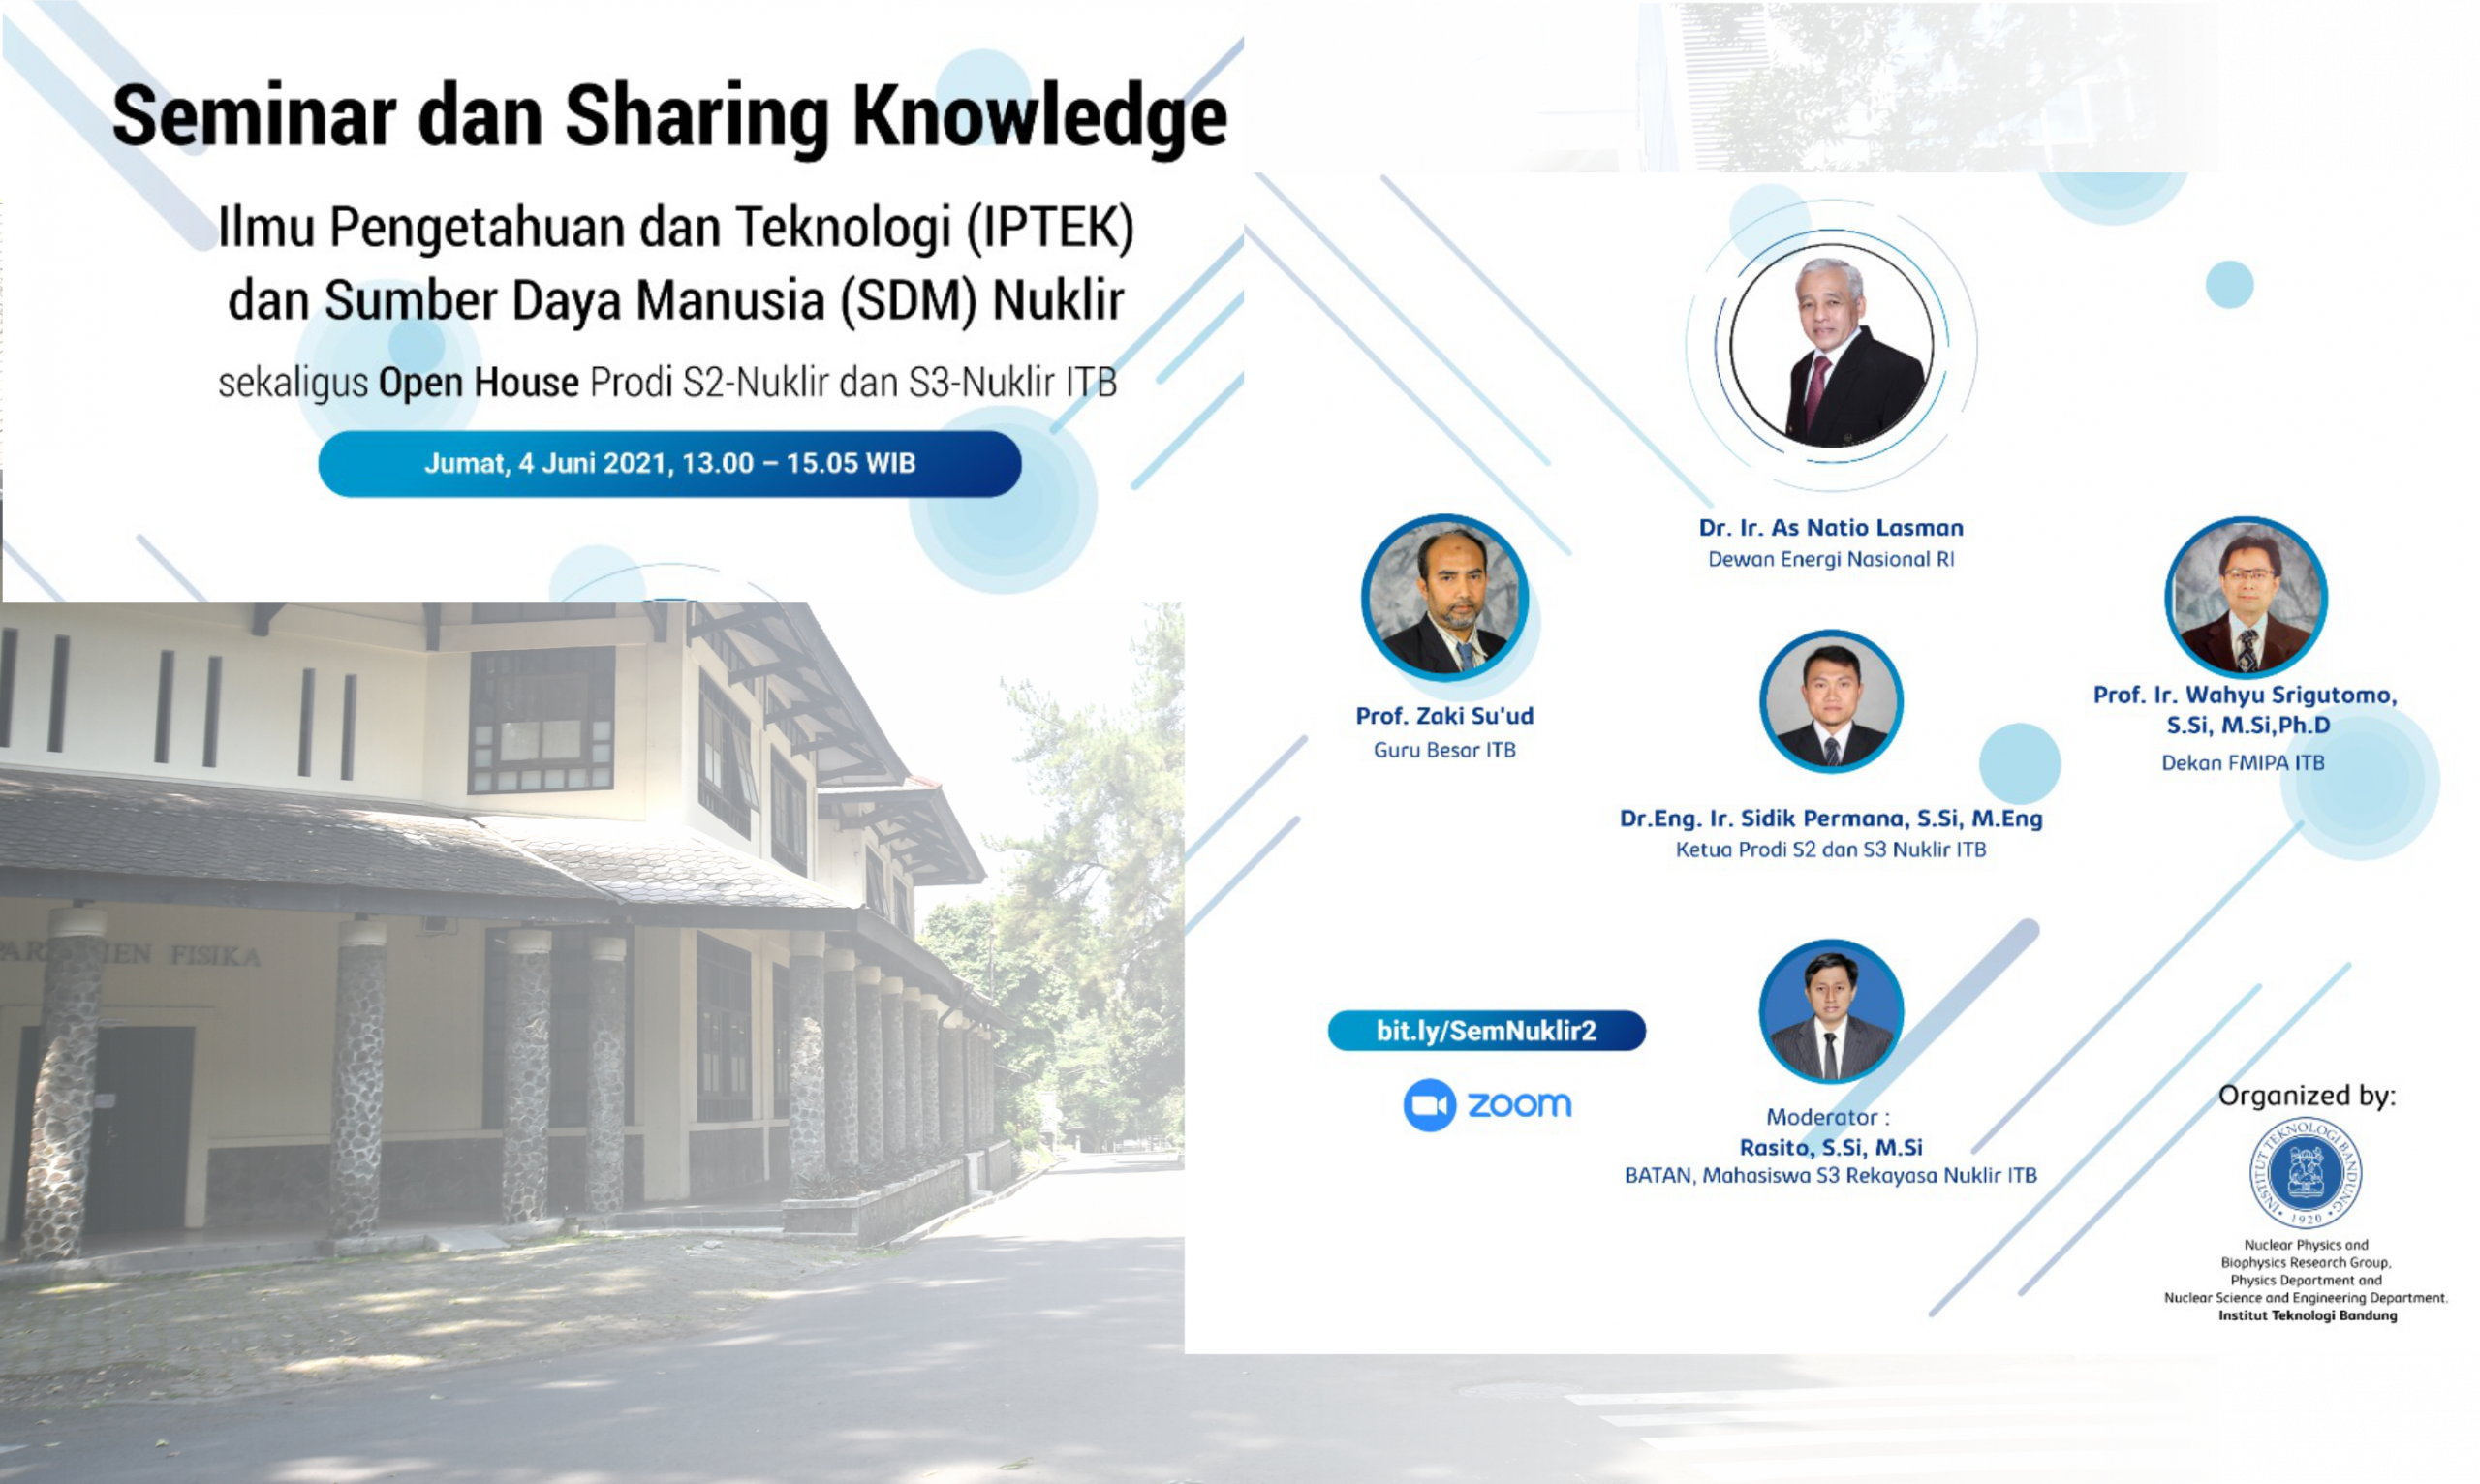 Seminar dan Sharing Knowledge Ilmu Pengetahuan dan Teknologi (IPTEK) dan Sumber Daya Manusia (SDM) Nuklir